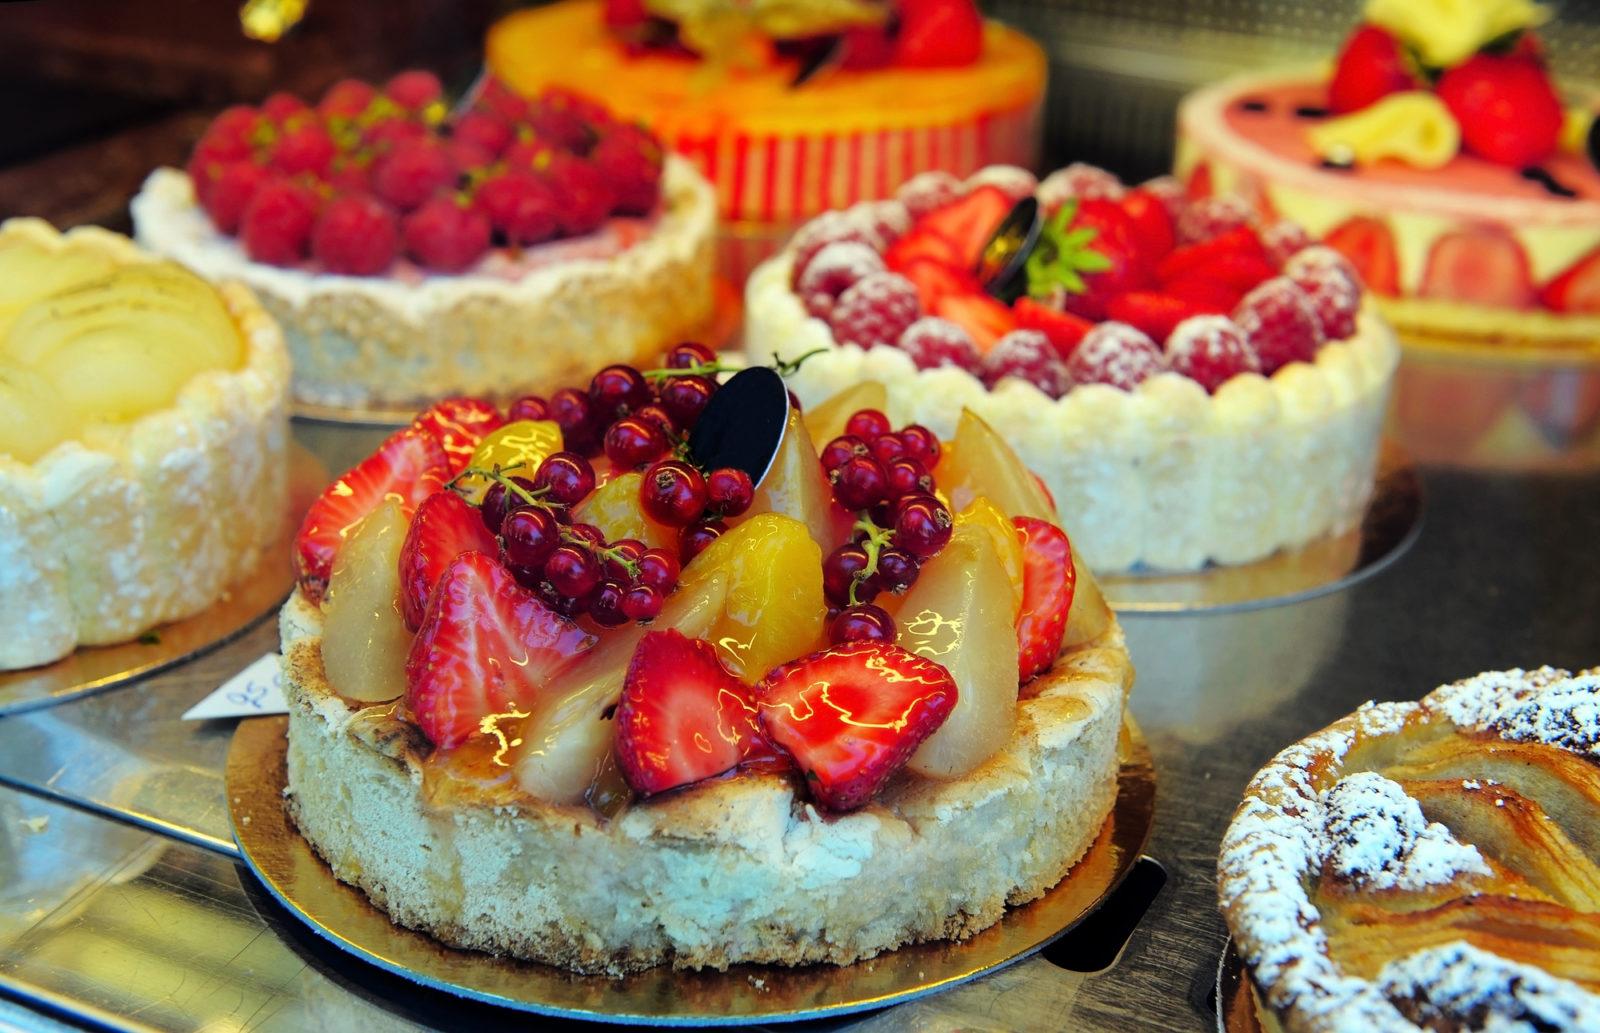 Creative Event Themes: Cake Decorating Extravaganza